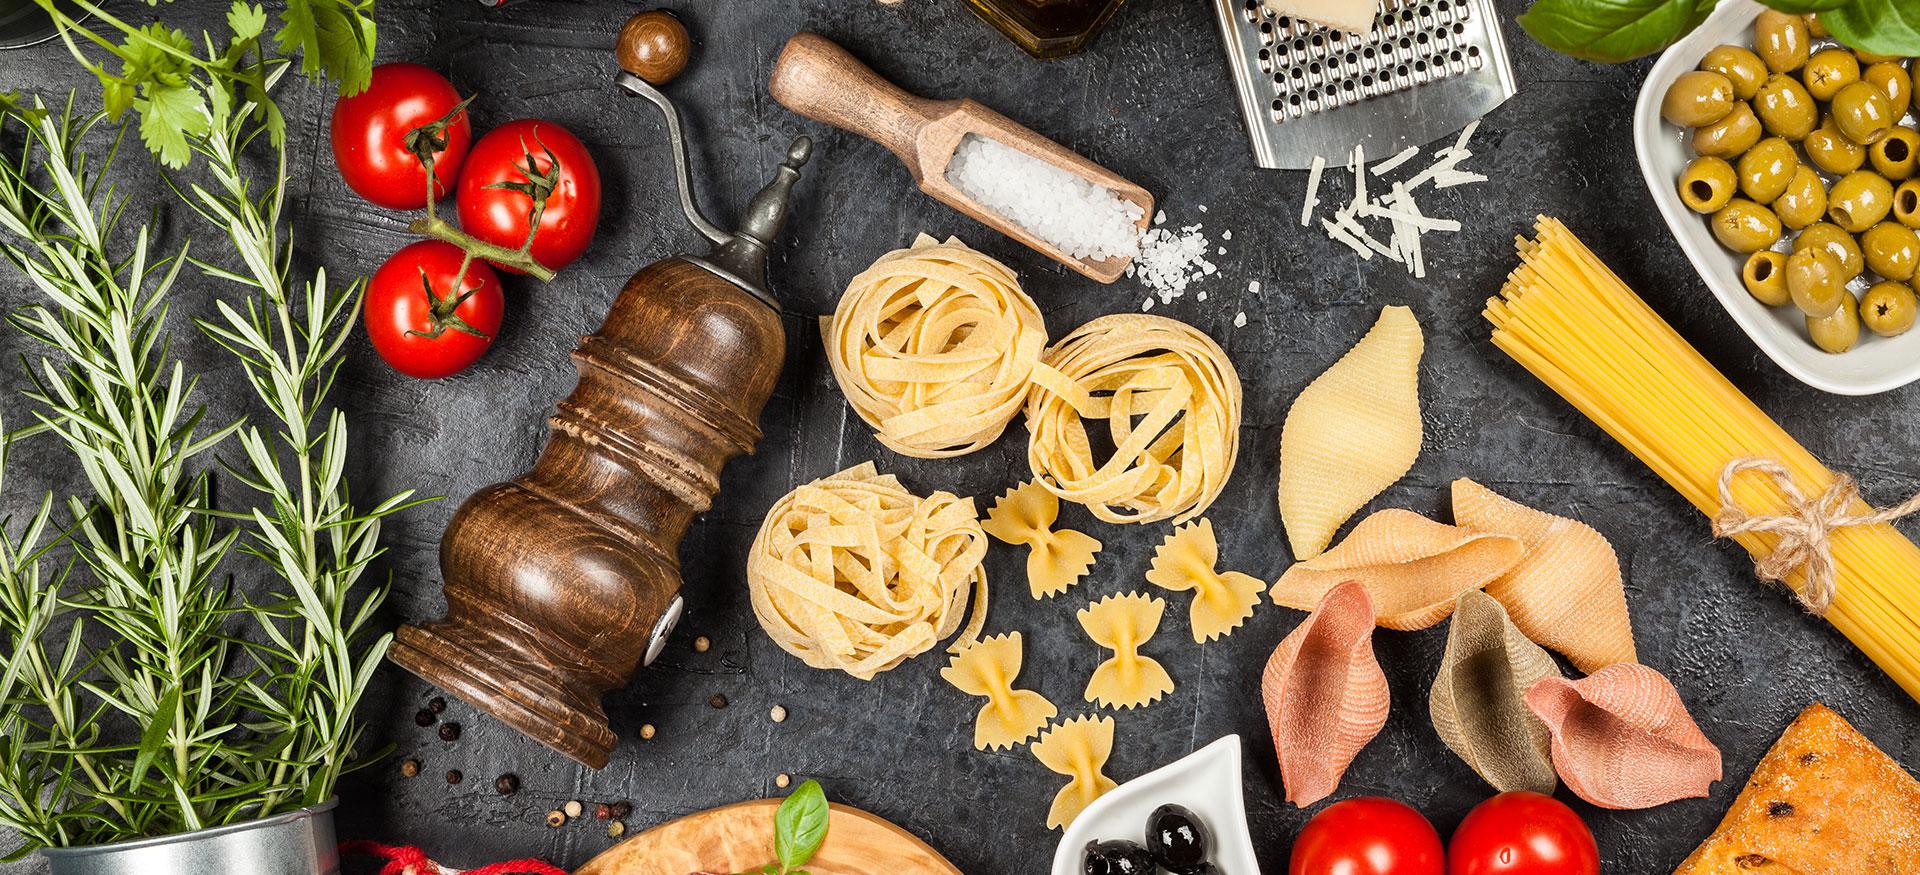 Kitchen etnic Italia extra virgin olive oil